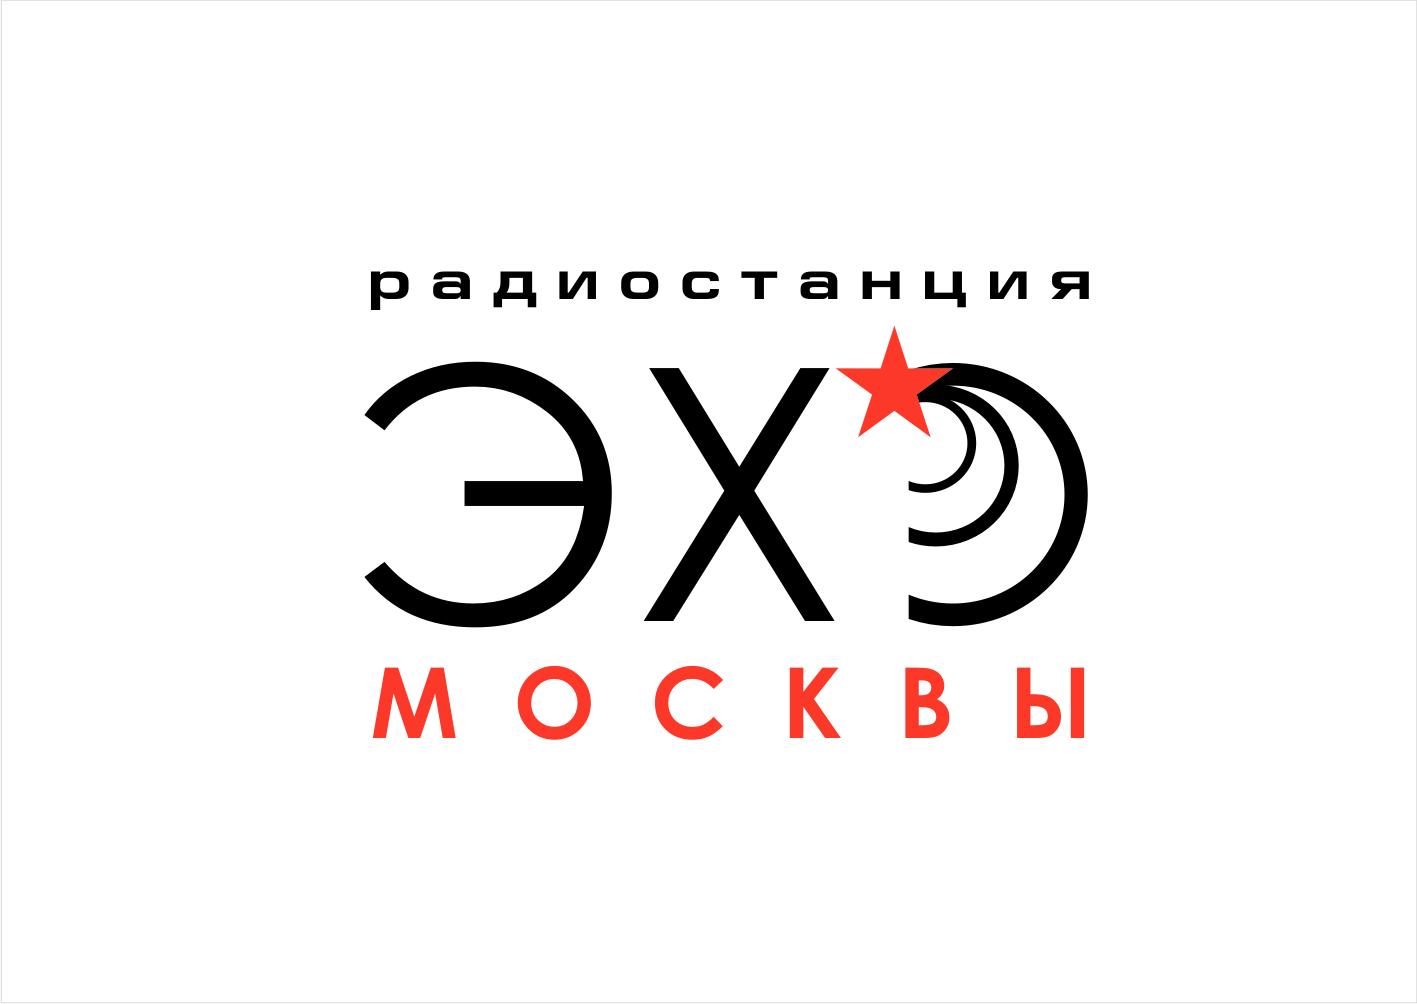 Дизайн логотипа р/с Эхо Москвы. фото f_28756266f5a50678.jpg